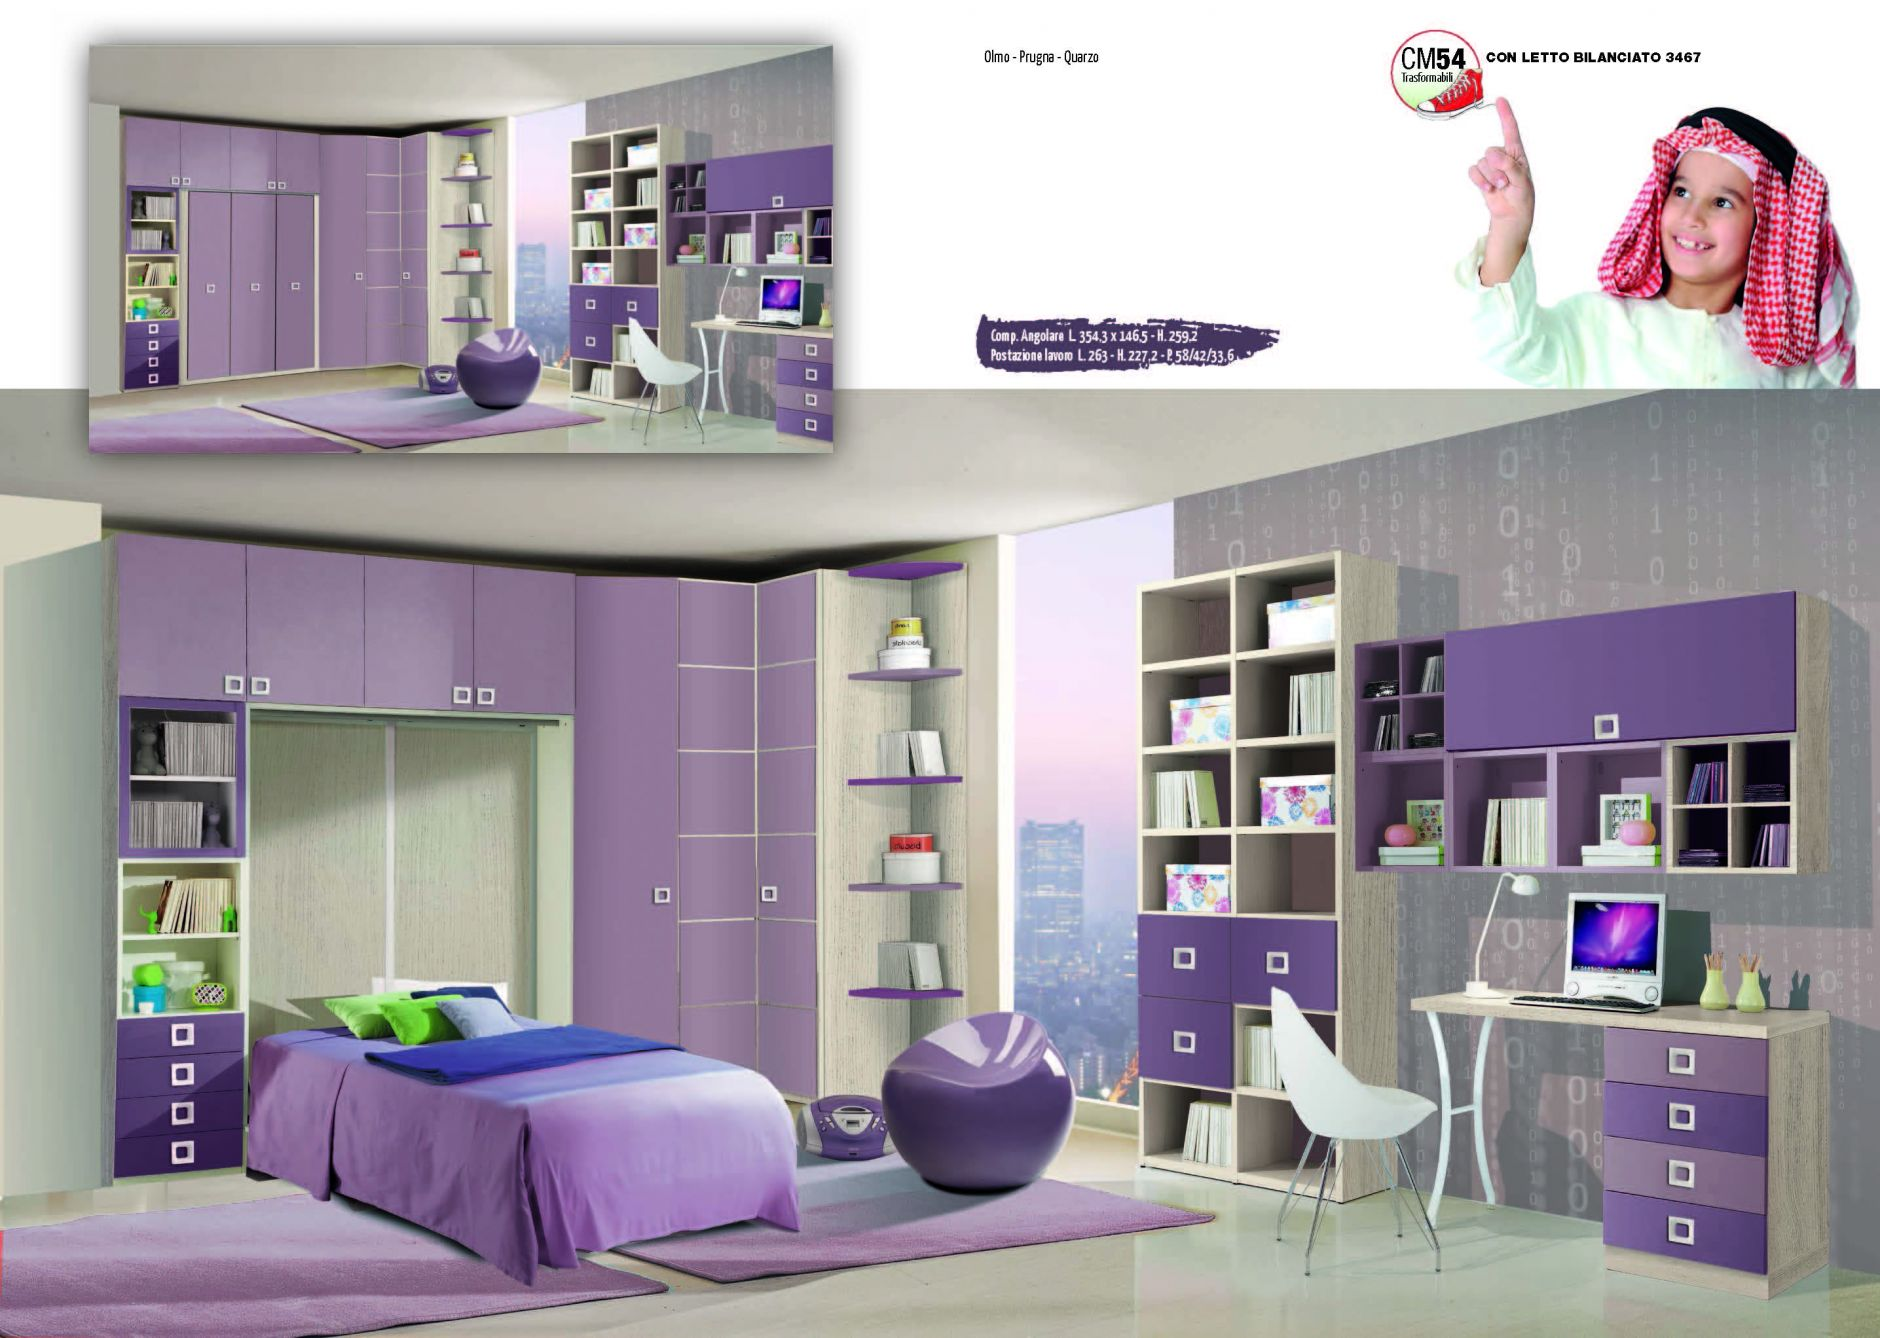 Muebles De Los Ni Os Muebles Giessegi Sm54 Composici N  # Giessegi Muebles Infantil